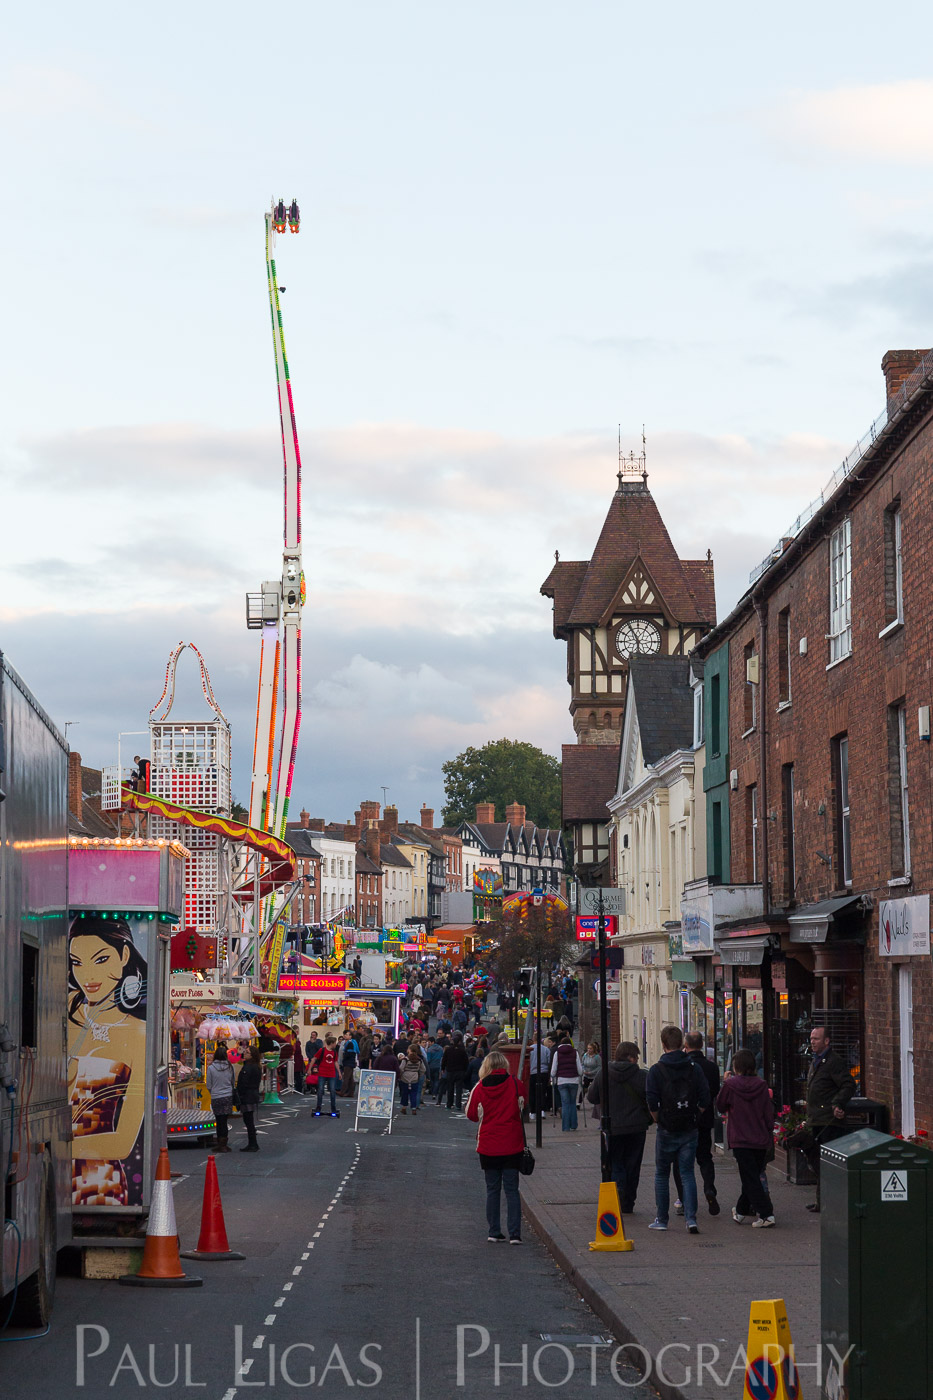 The Ledbury Fair, Herefordshire, people, street photographer photography event candid 2139